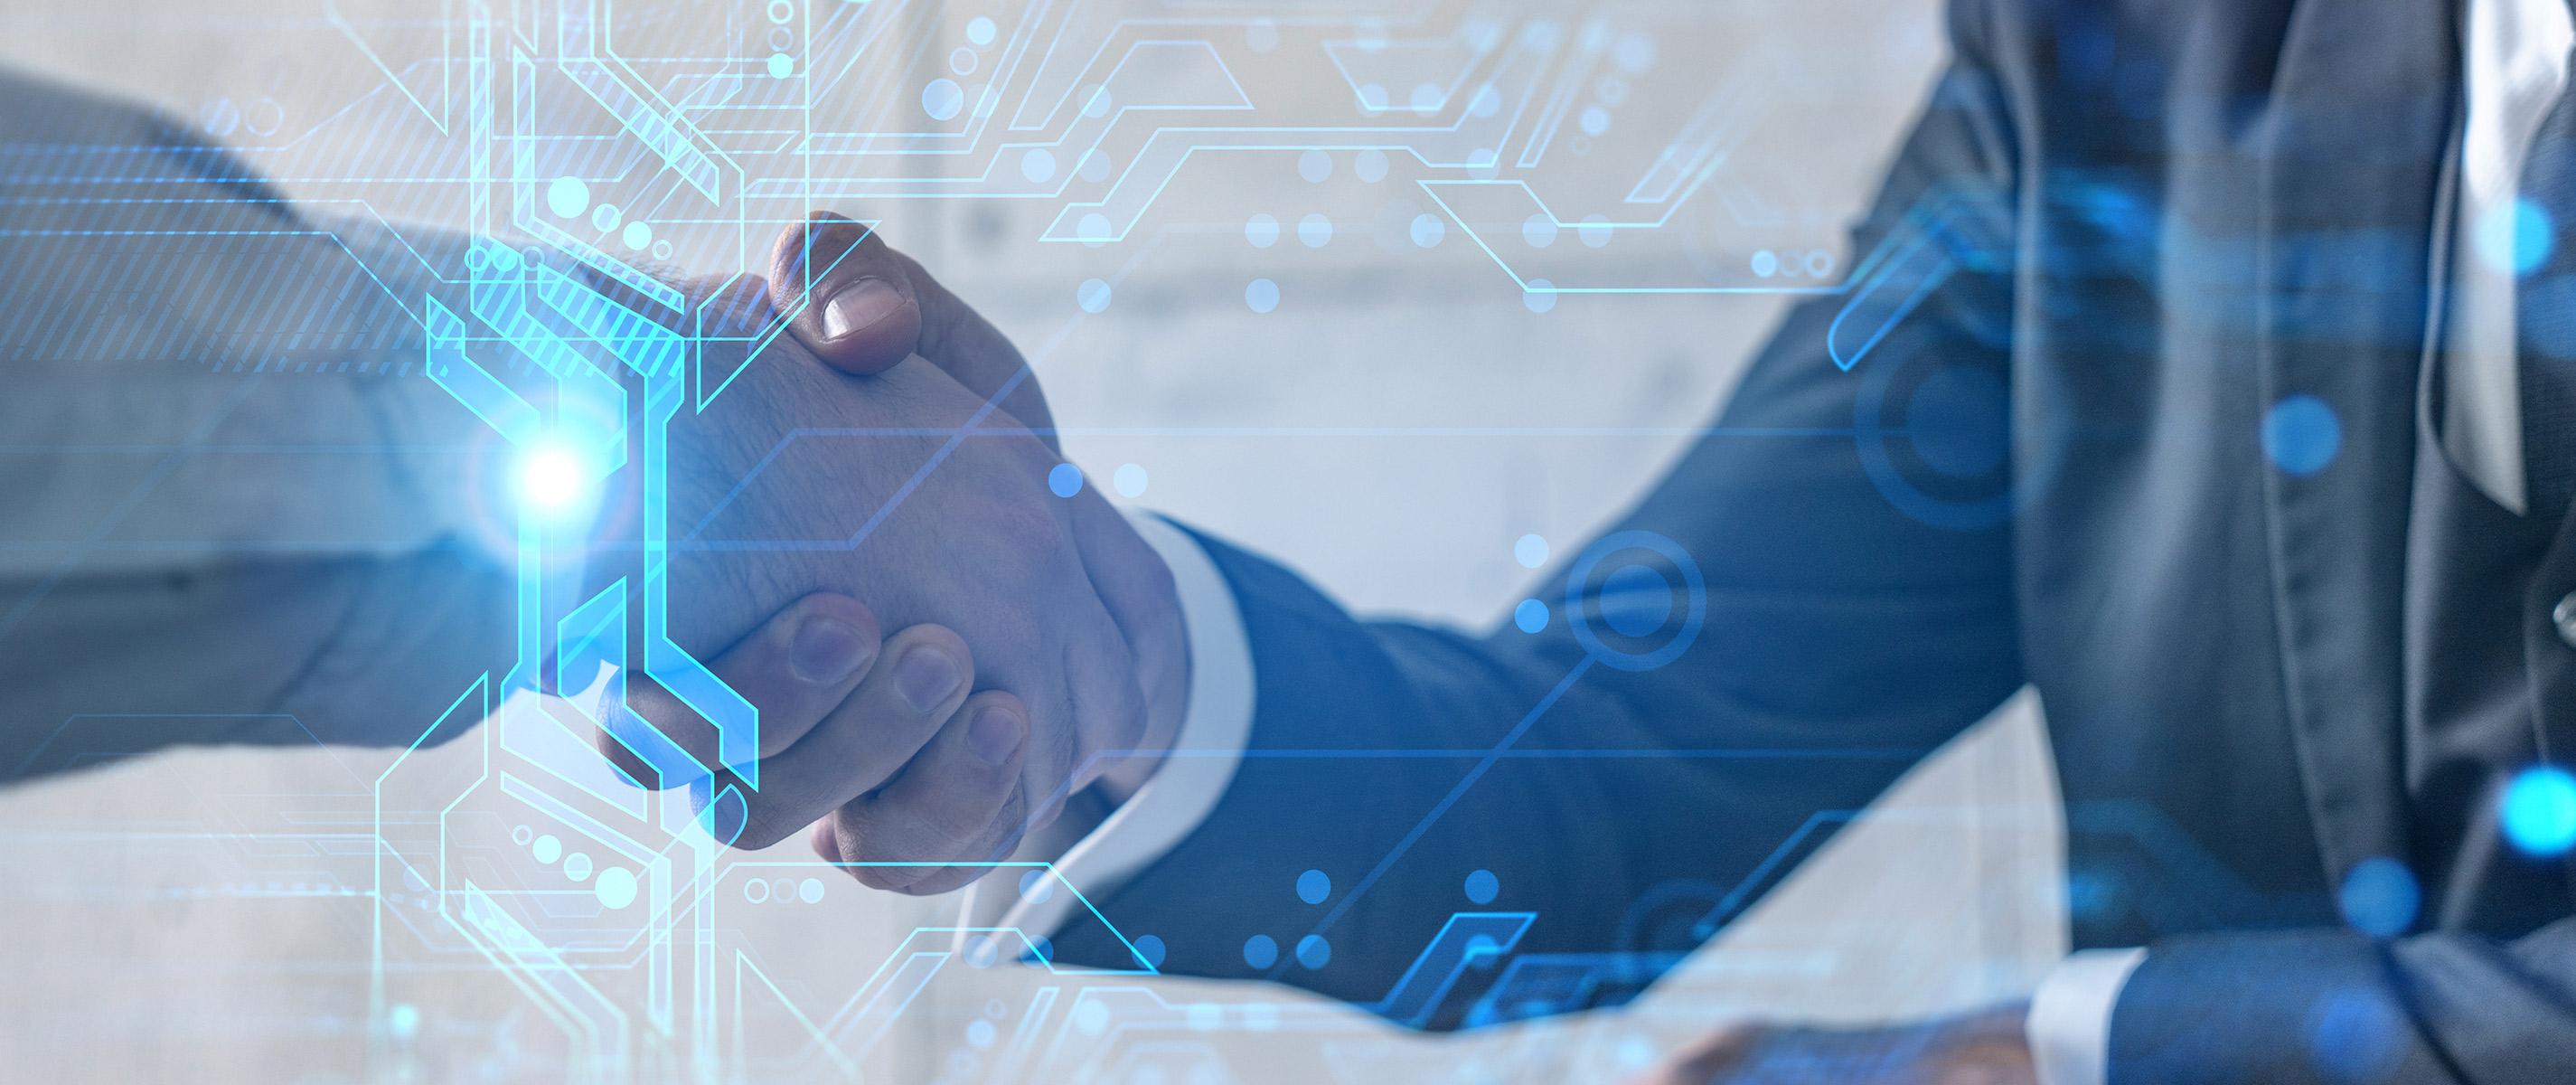 Momentive Quartz Technologies (MQT) Selects Kellton Tech to Implement SAP S/4HANA